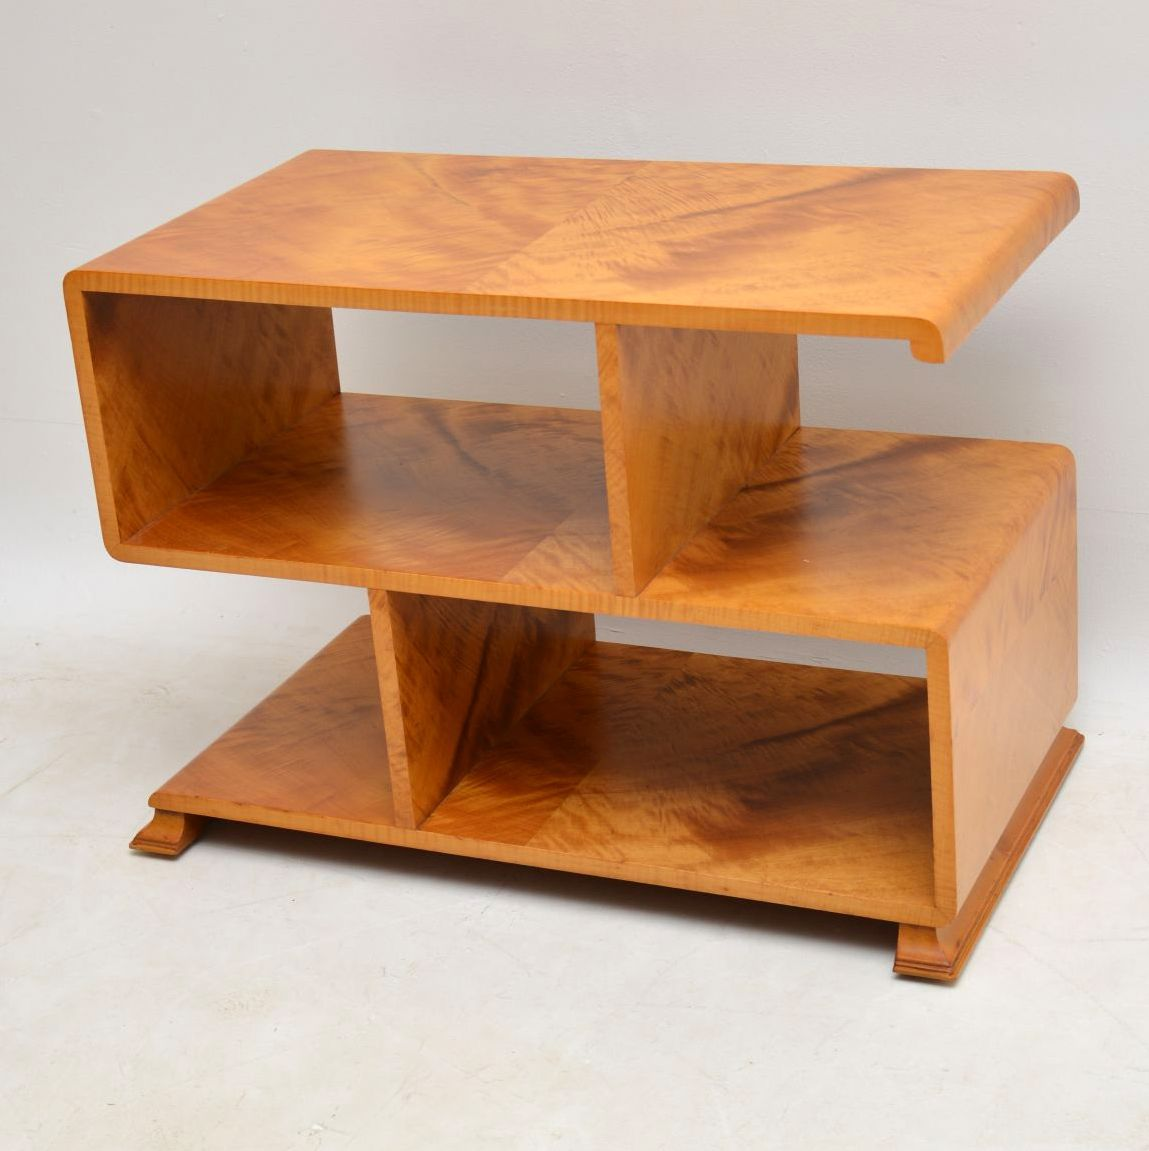 art_deco_antique_vintage_satin_wood_side_table_4